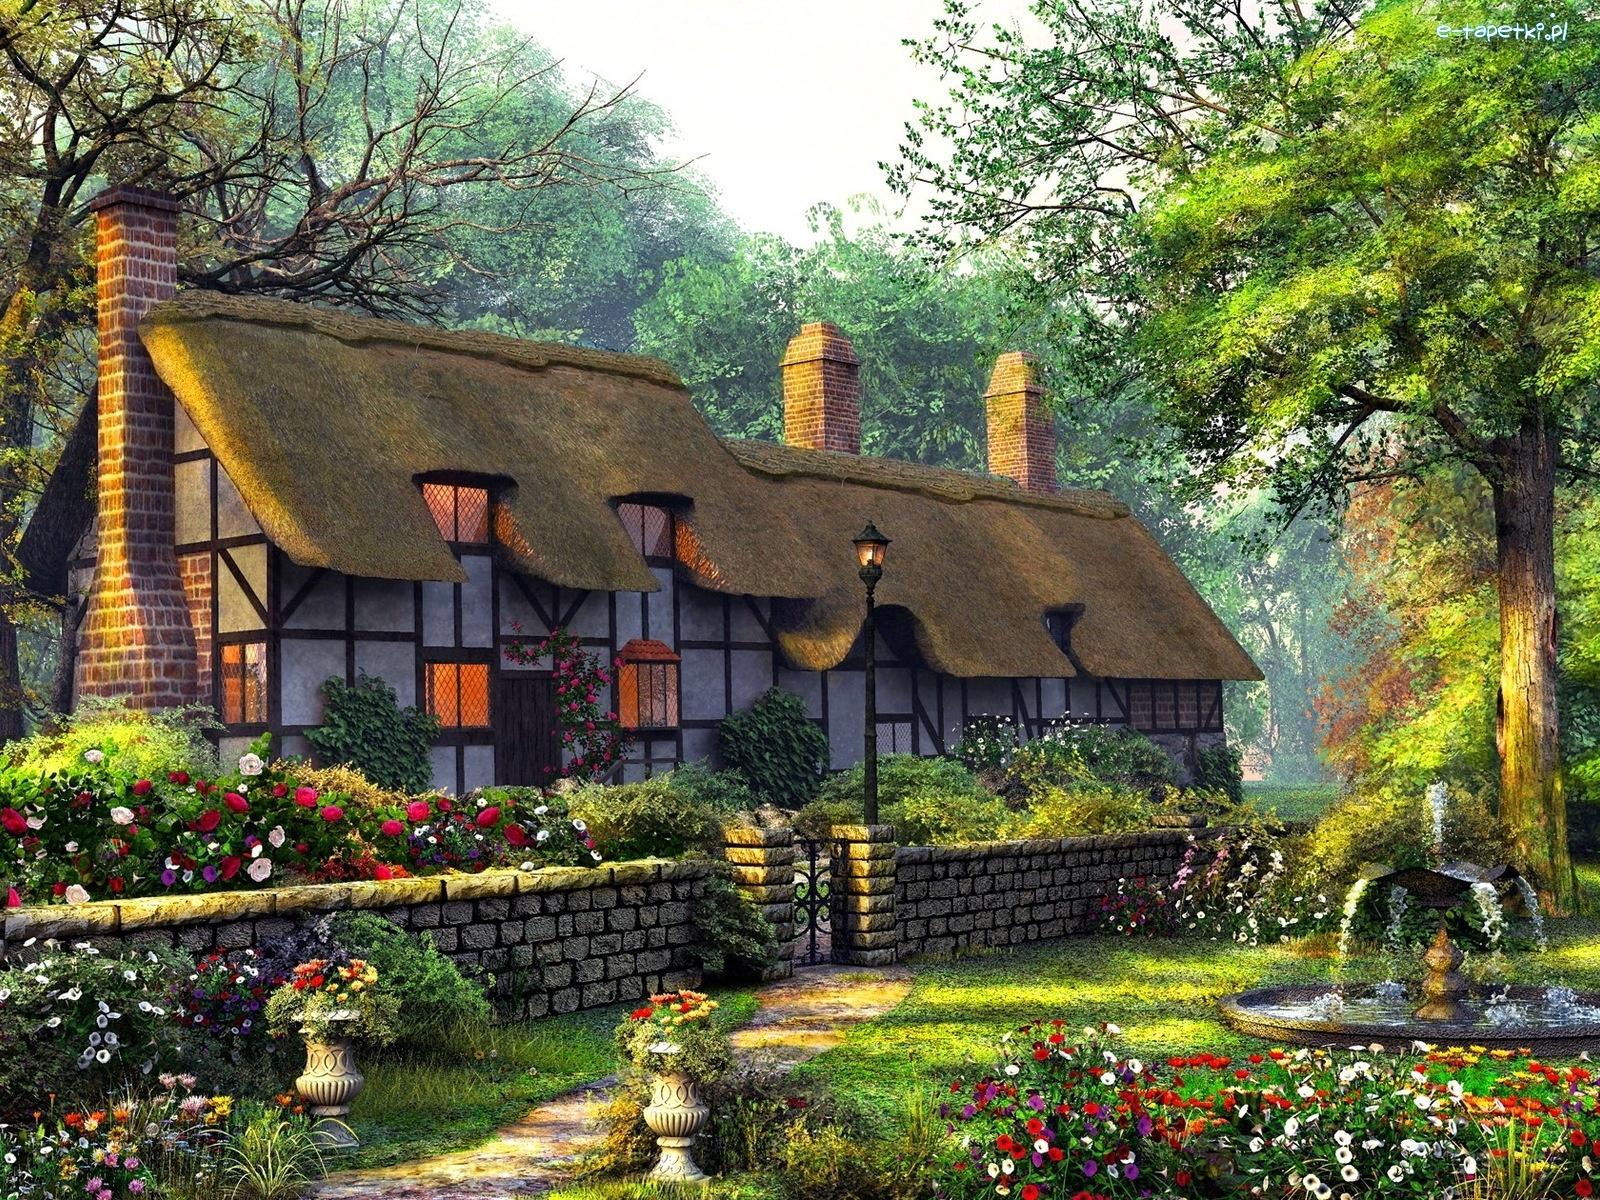 Картинка деревни рисованная